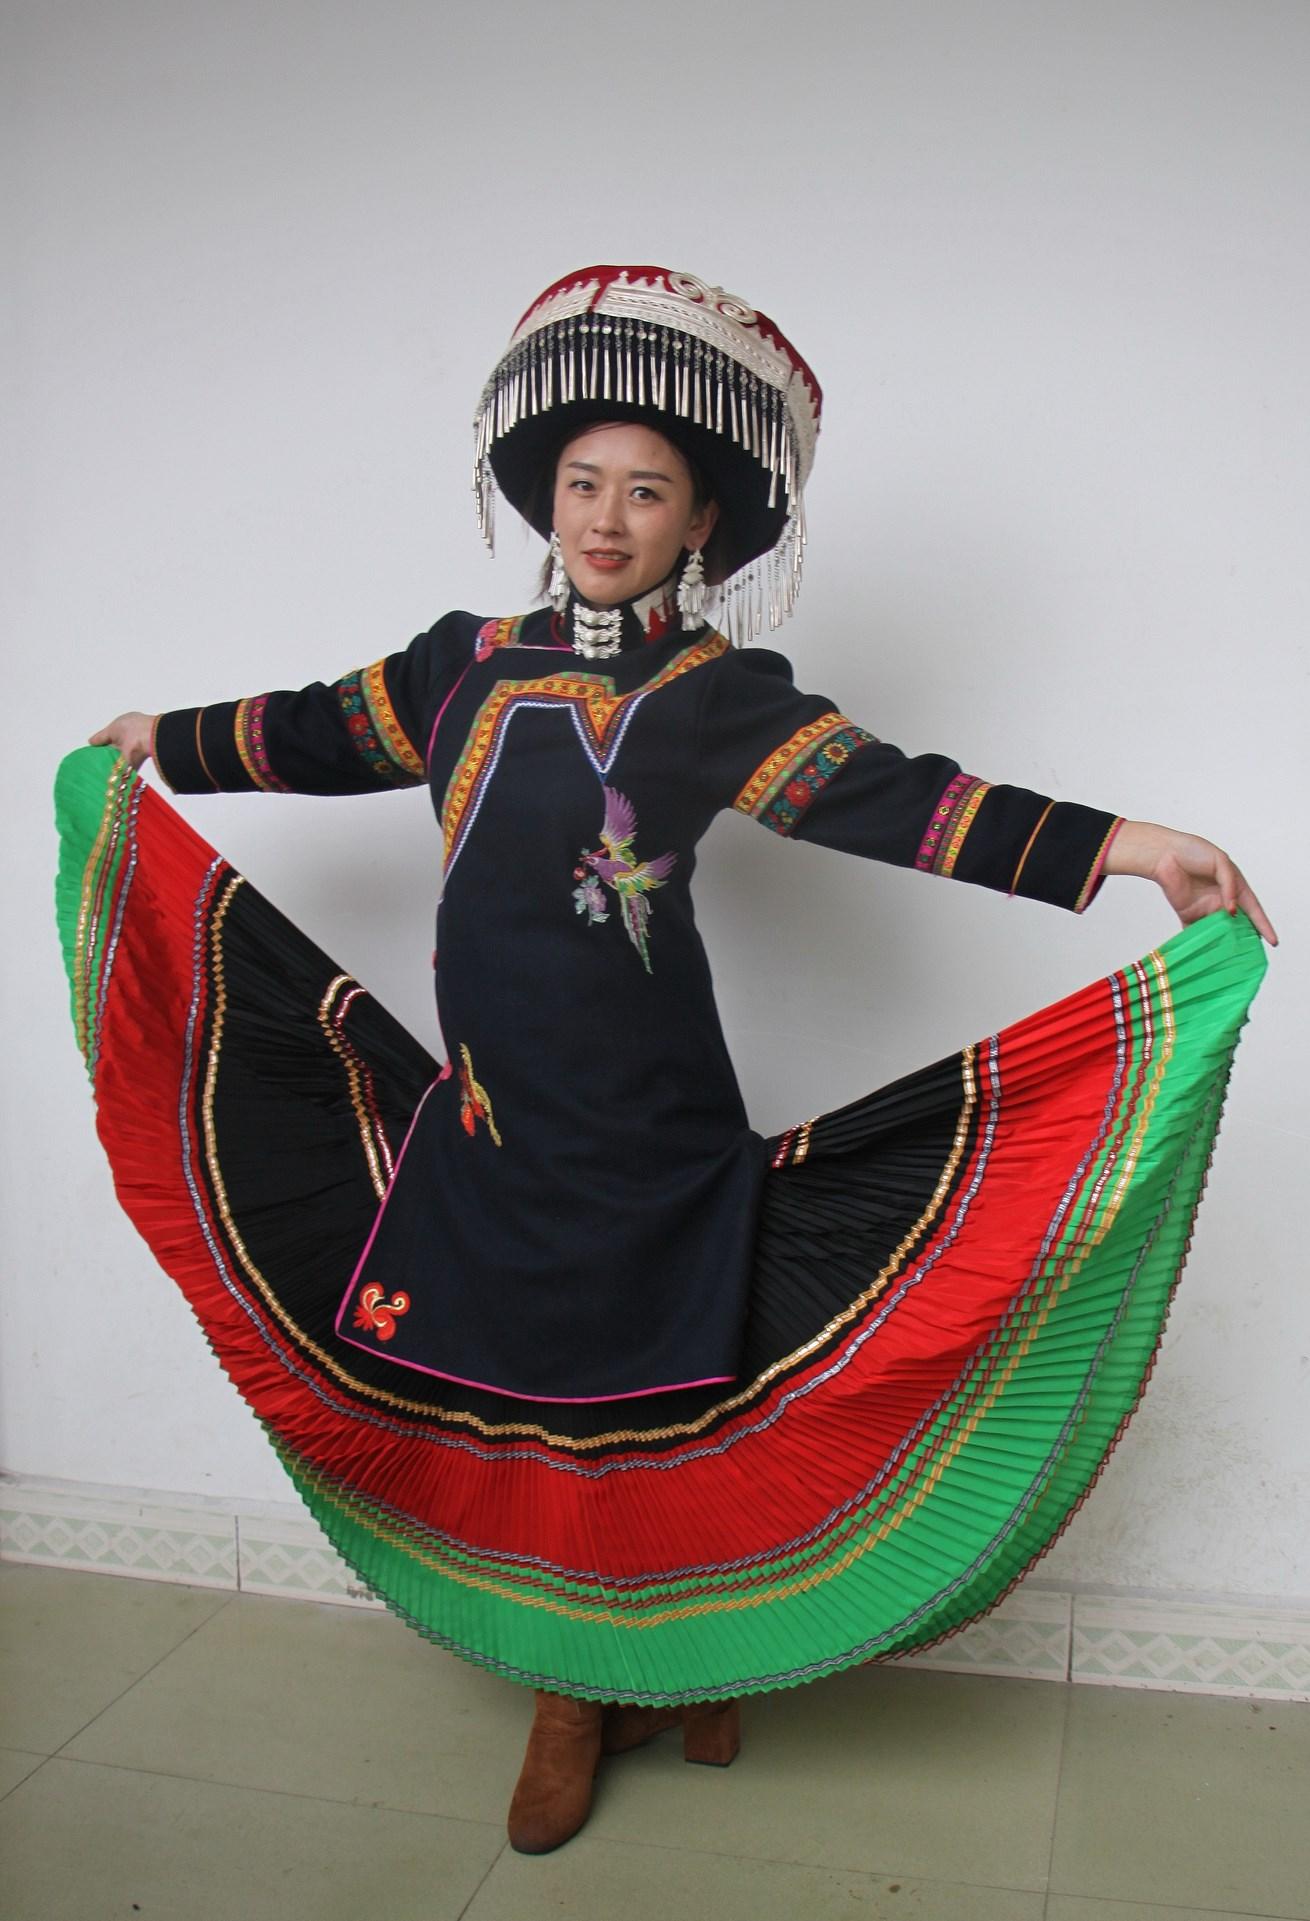 7702560e568c53 Yi (grupa etniczna) – Wikipedia, wolna encyklopedia